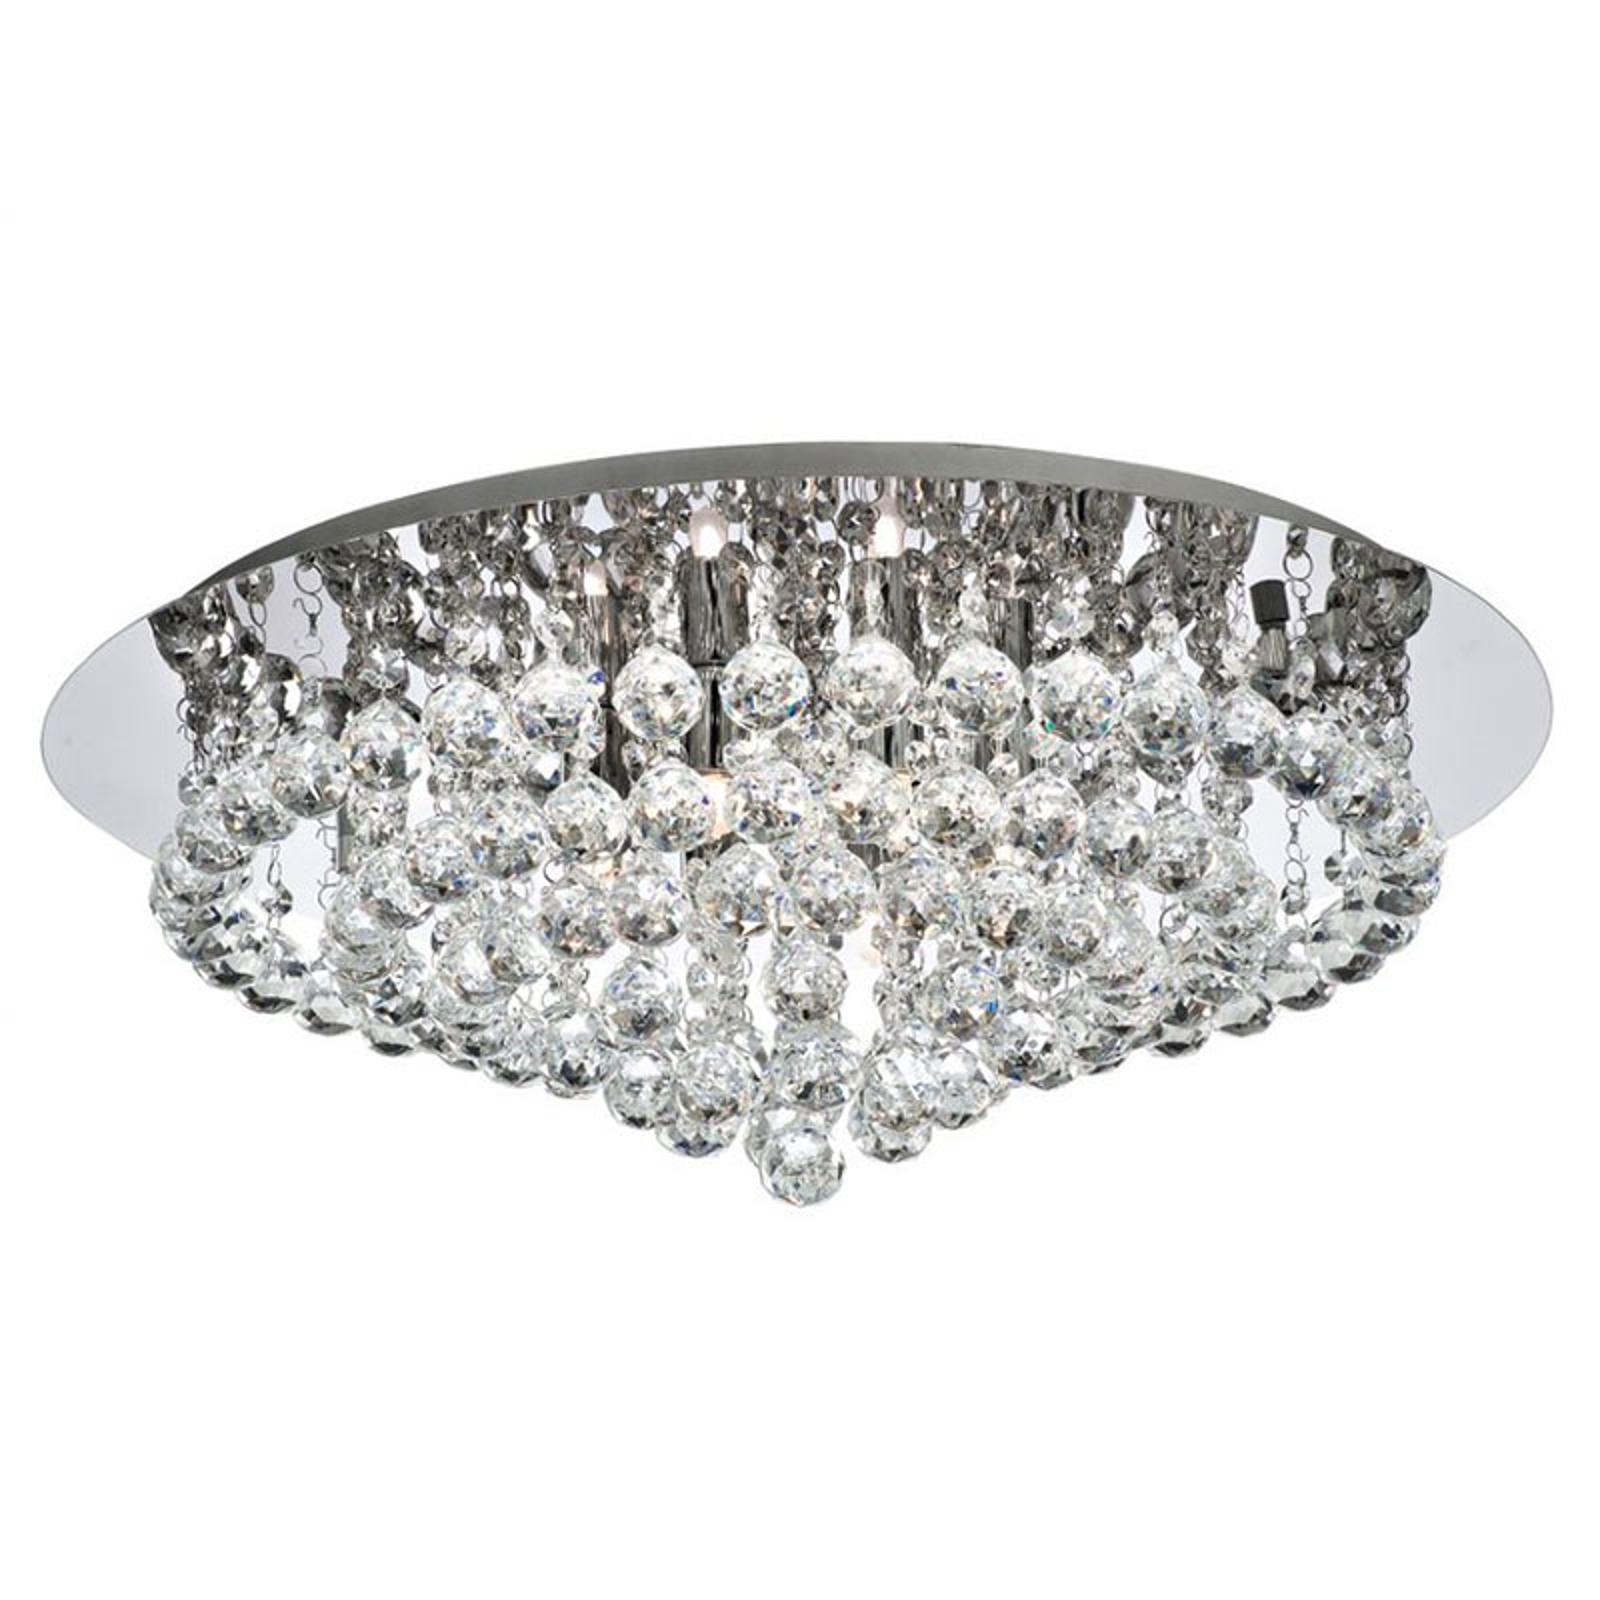 Plafondlamp Hanna chroom kristallen bollen 55cm